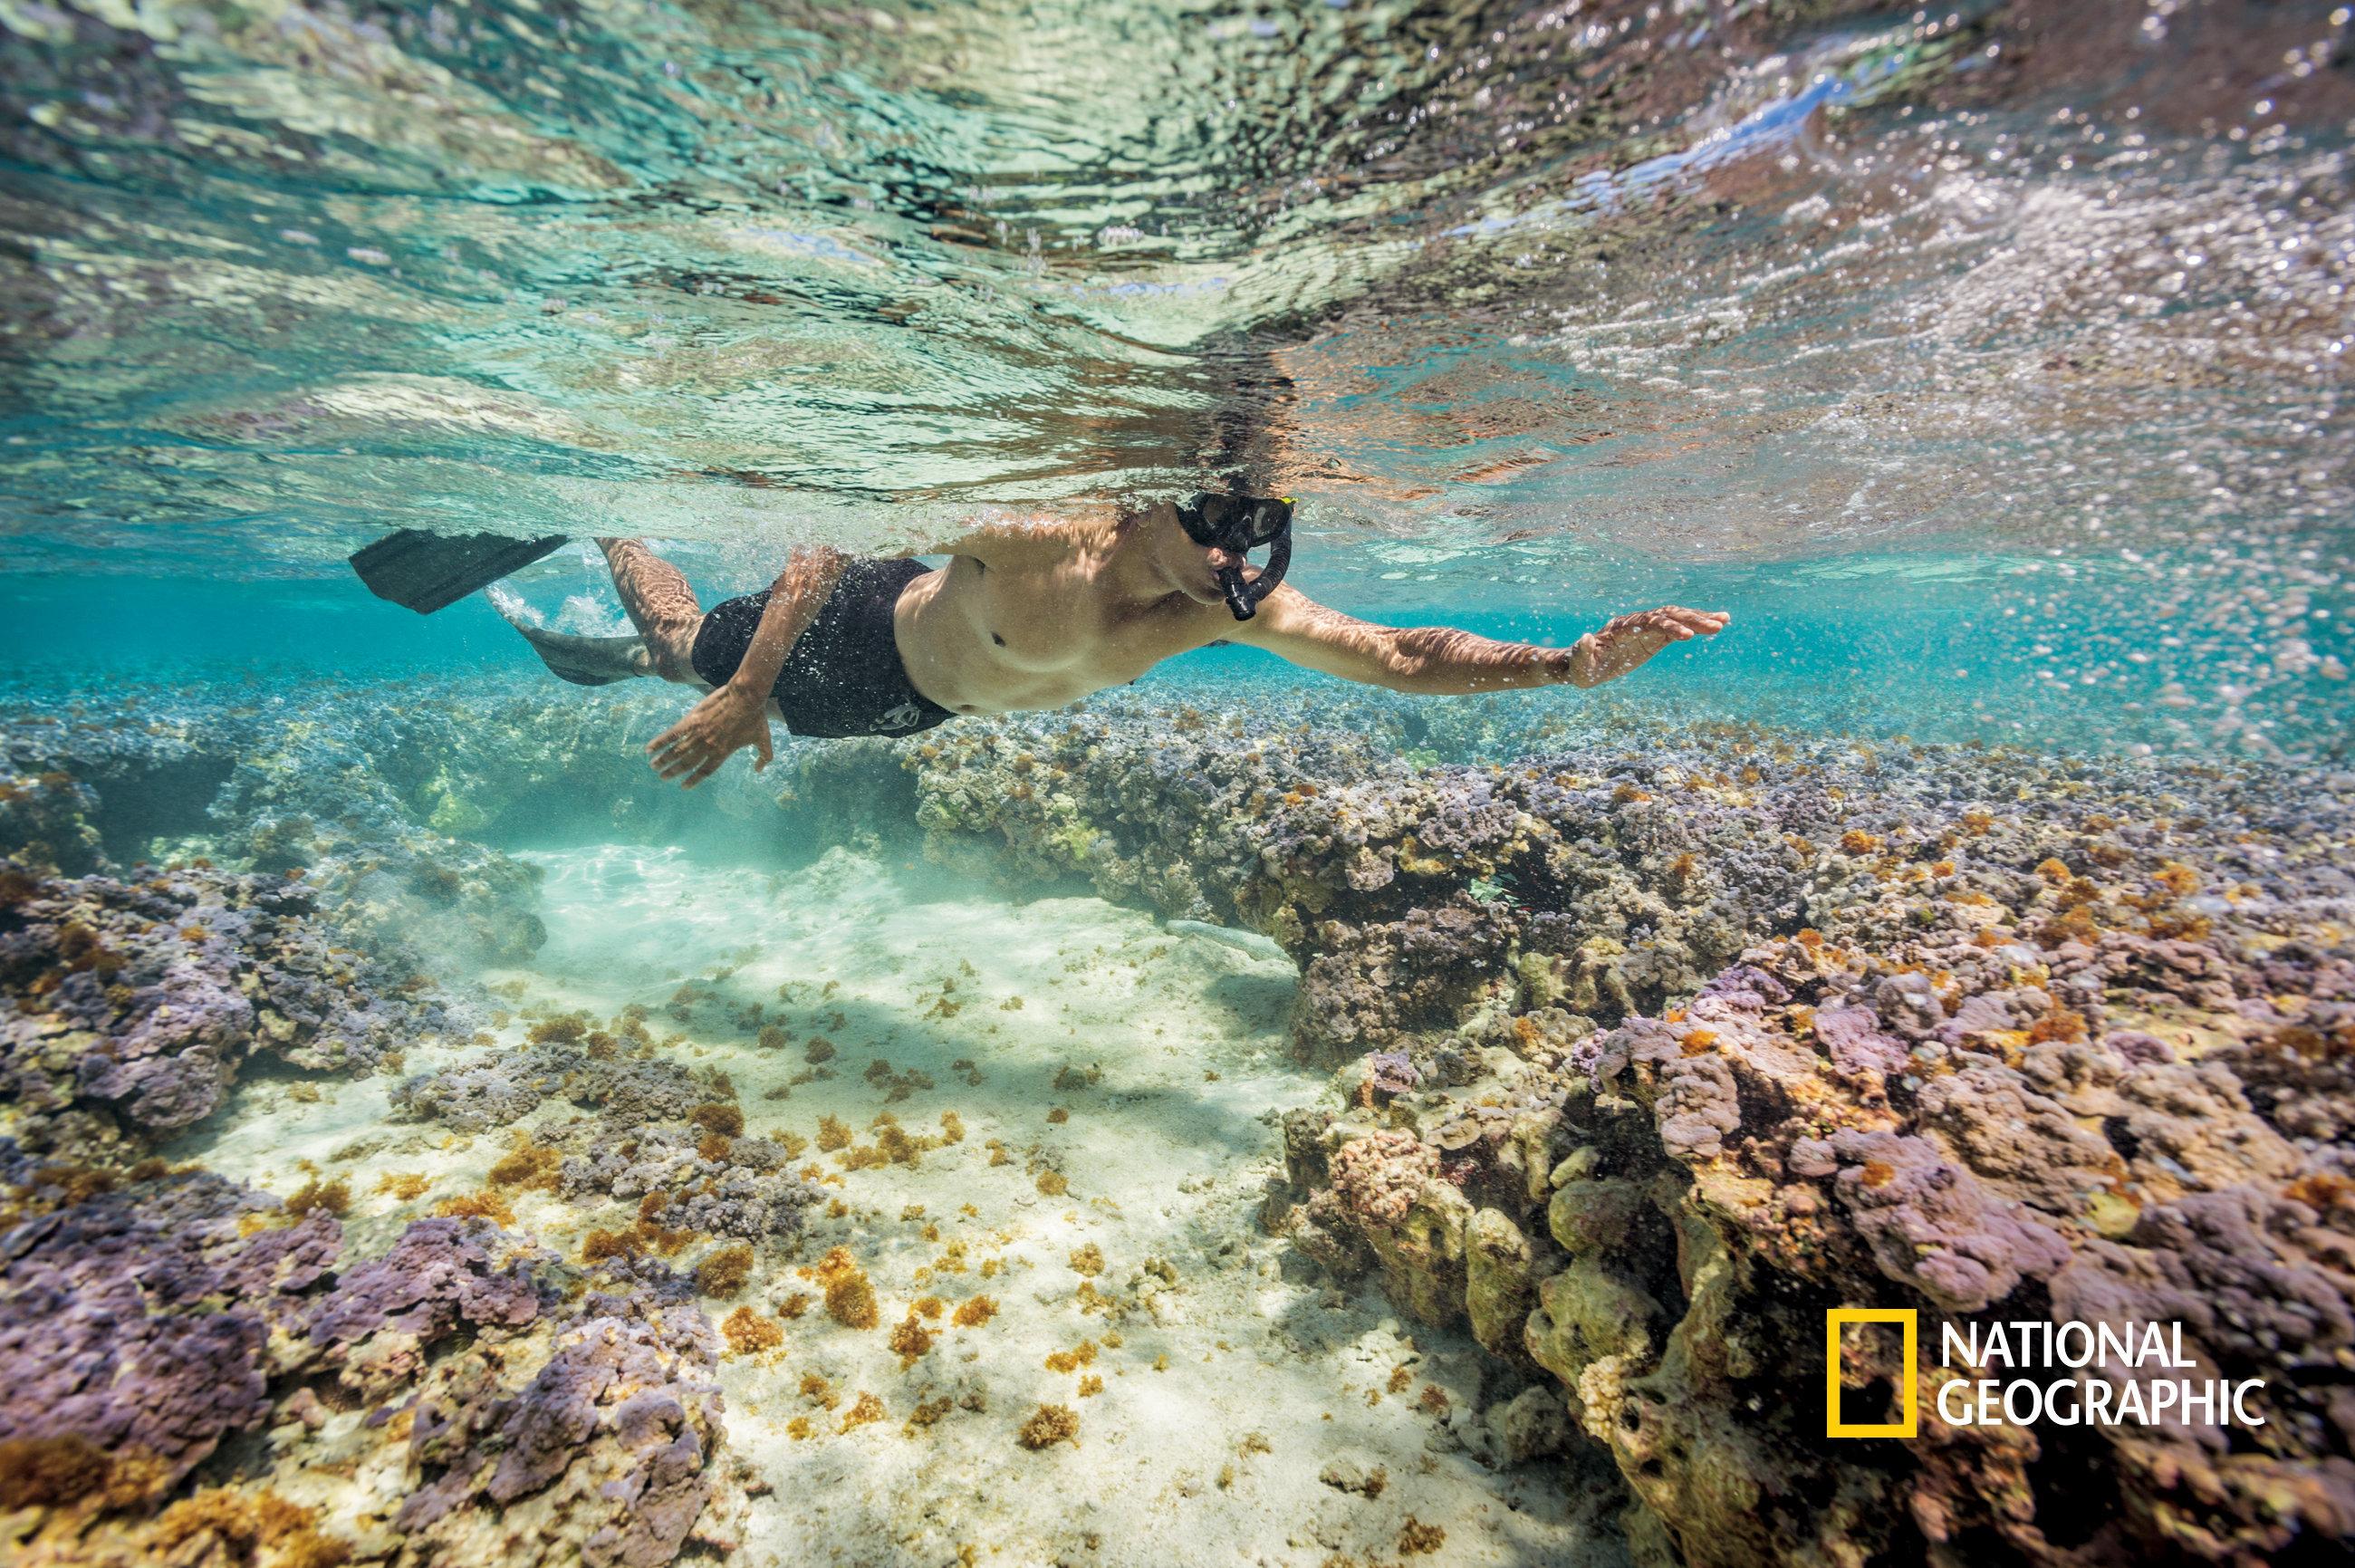 Barack Obama Somehow Manages To Make Even Snorkeling Look